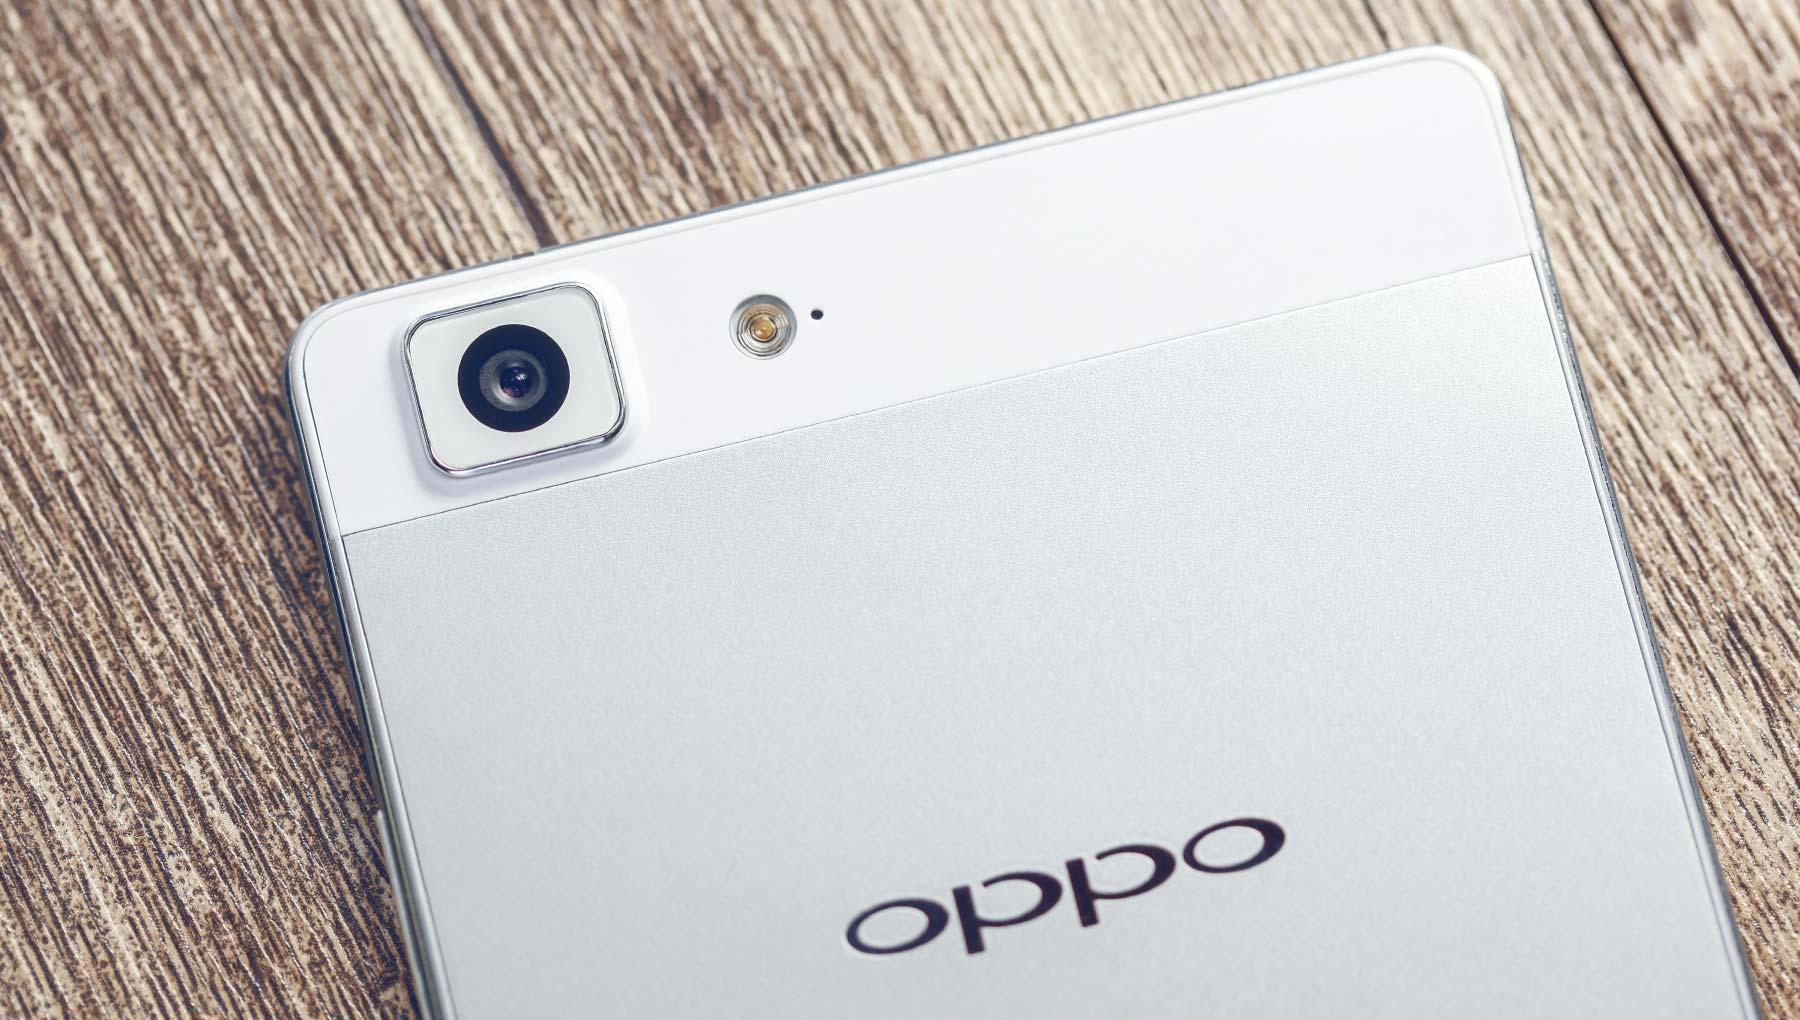 OPPO R5  ที่สุดของความบางคุณสัมผัสได้